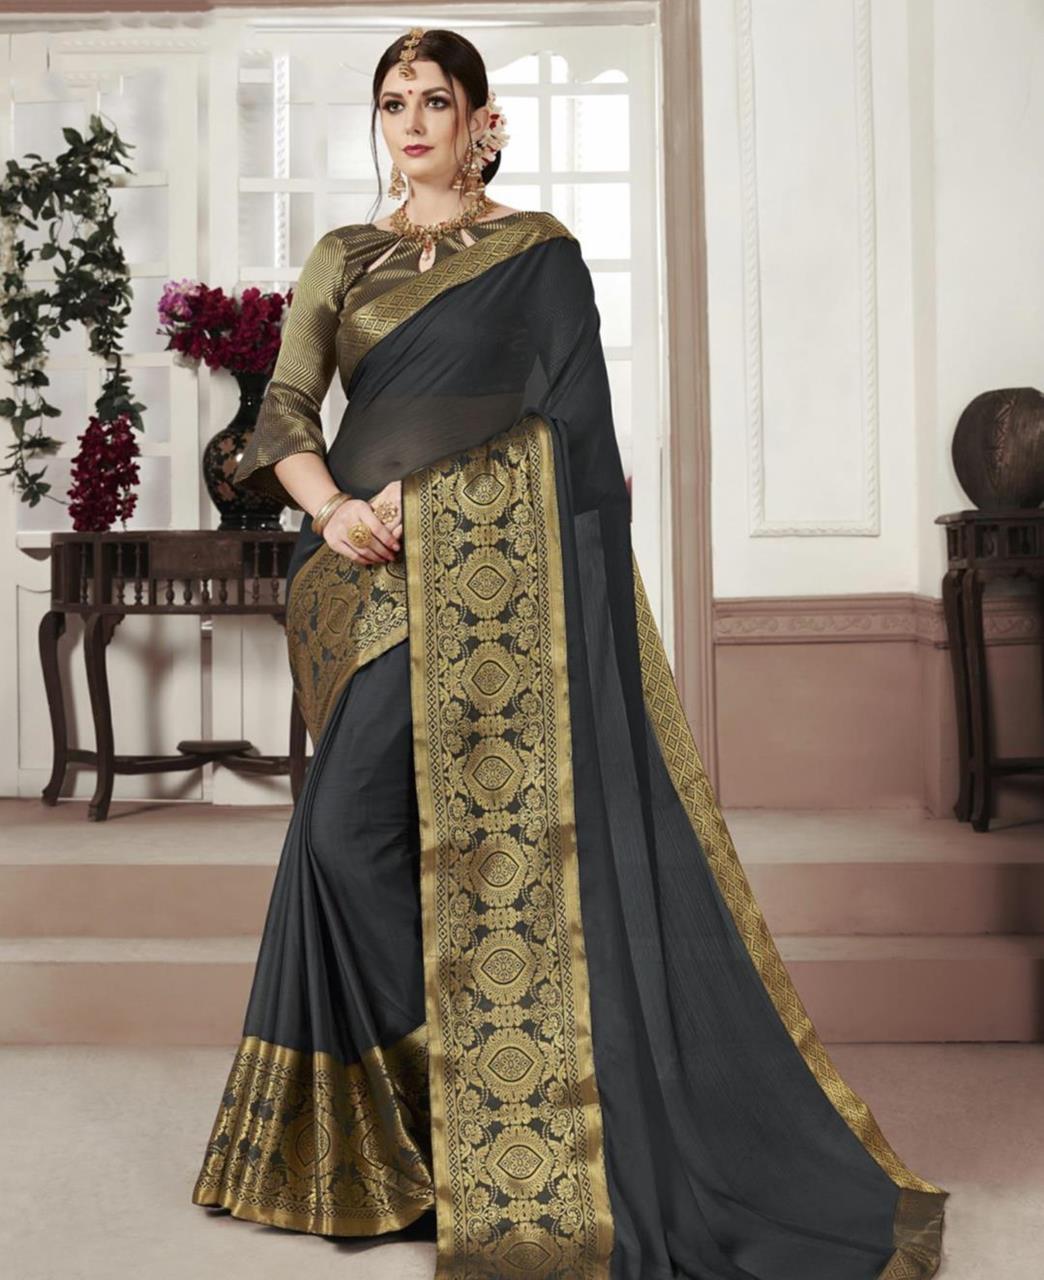 Woven Chiffon Saree (Sari) in Gray